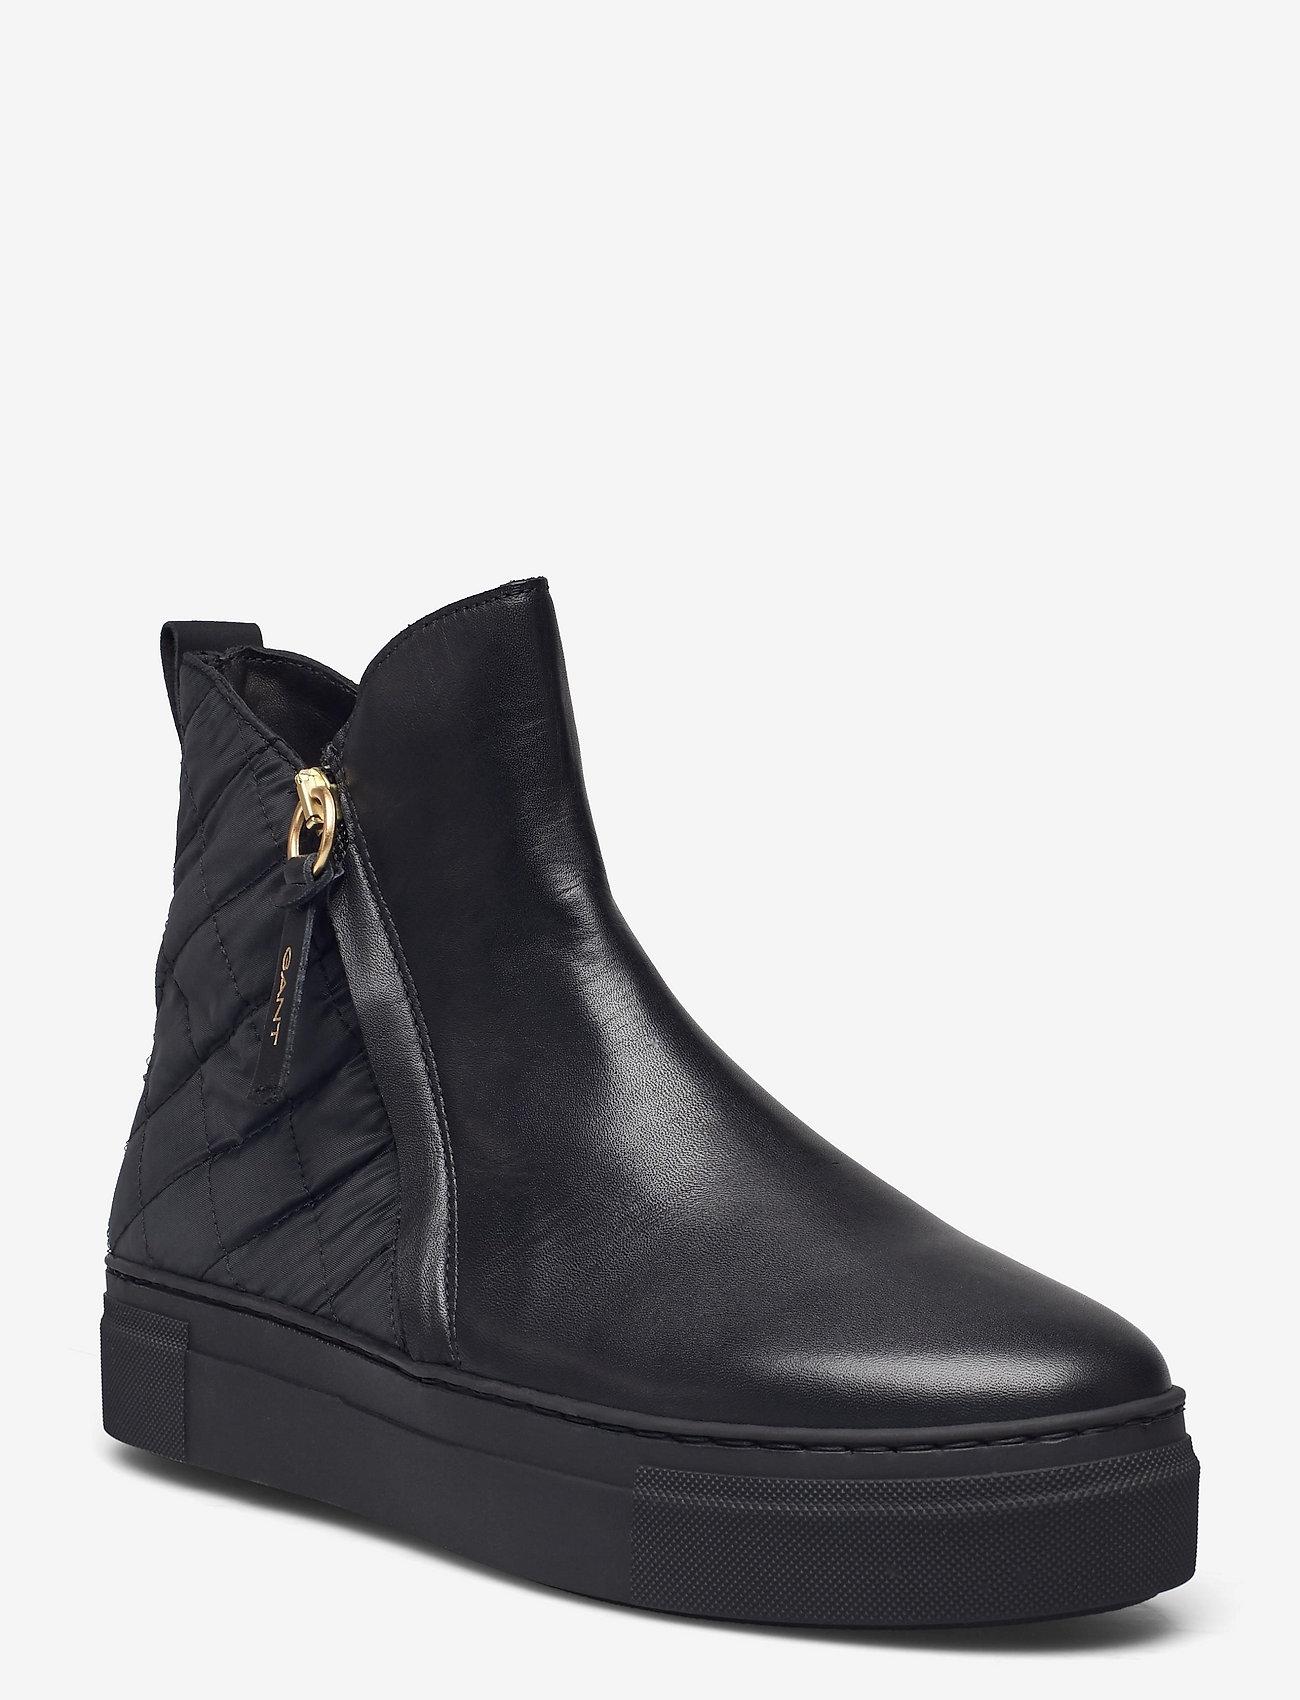 GANT - Vanna Mid Zip boot - flat ankle boots - black - 0